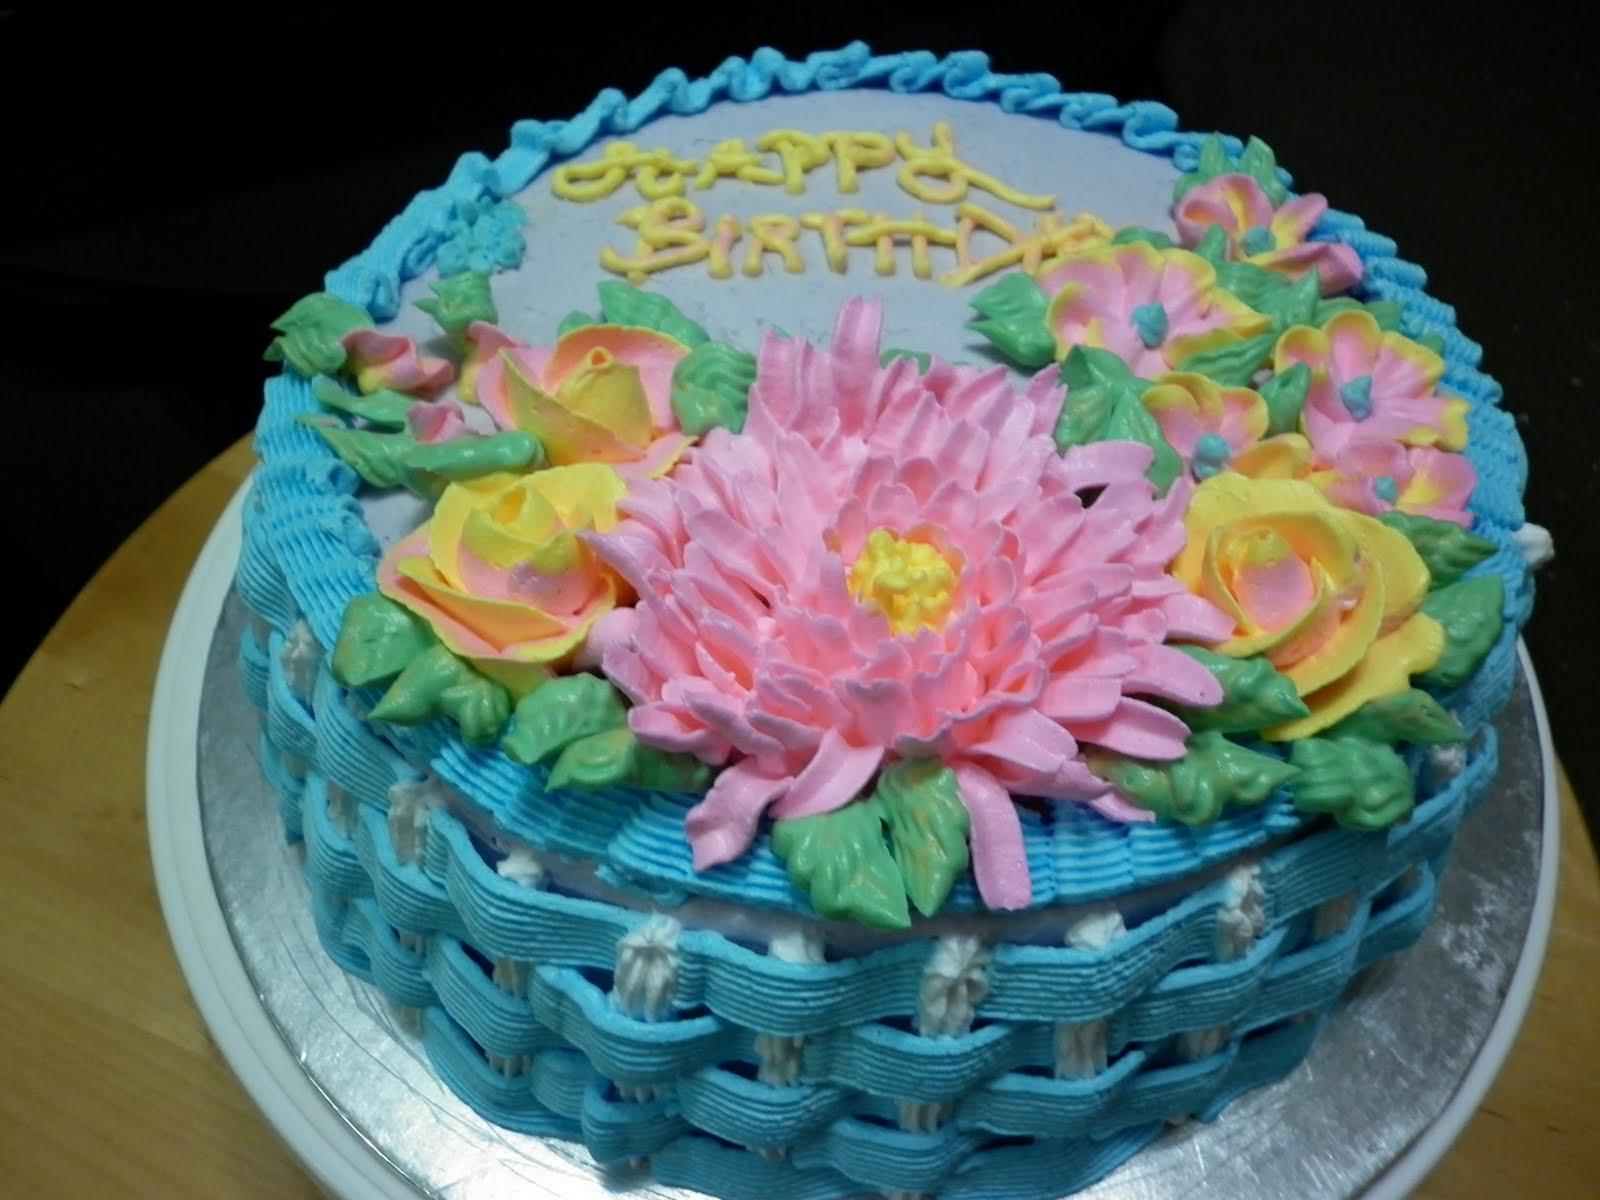 Bake Cake For All A Birthday Cake